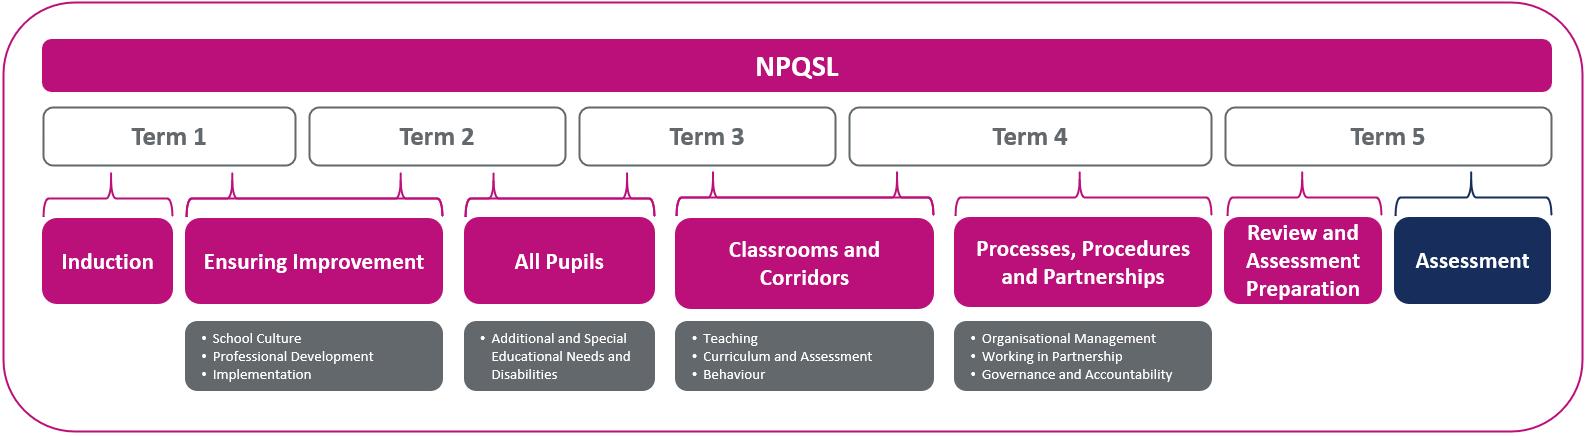 NPQSL Sequence